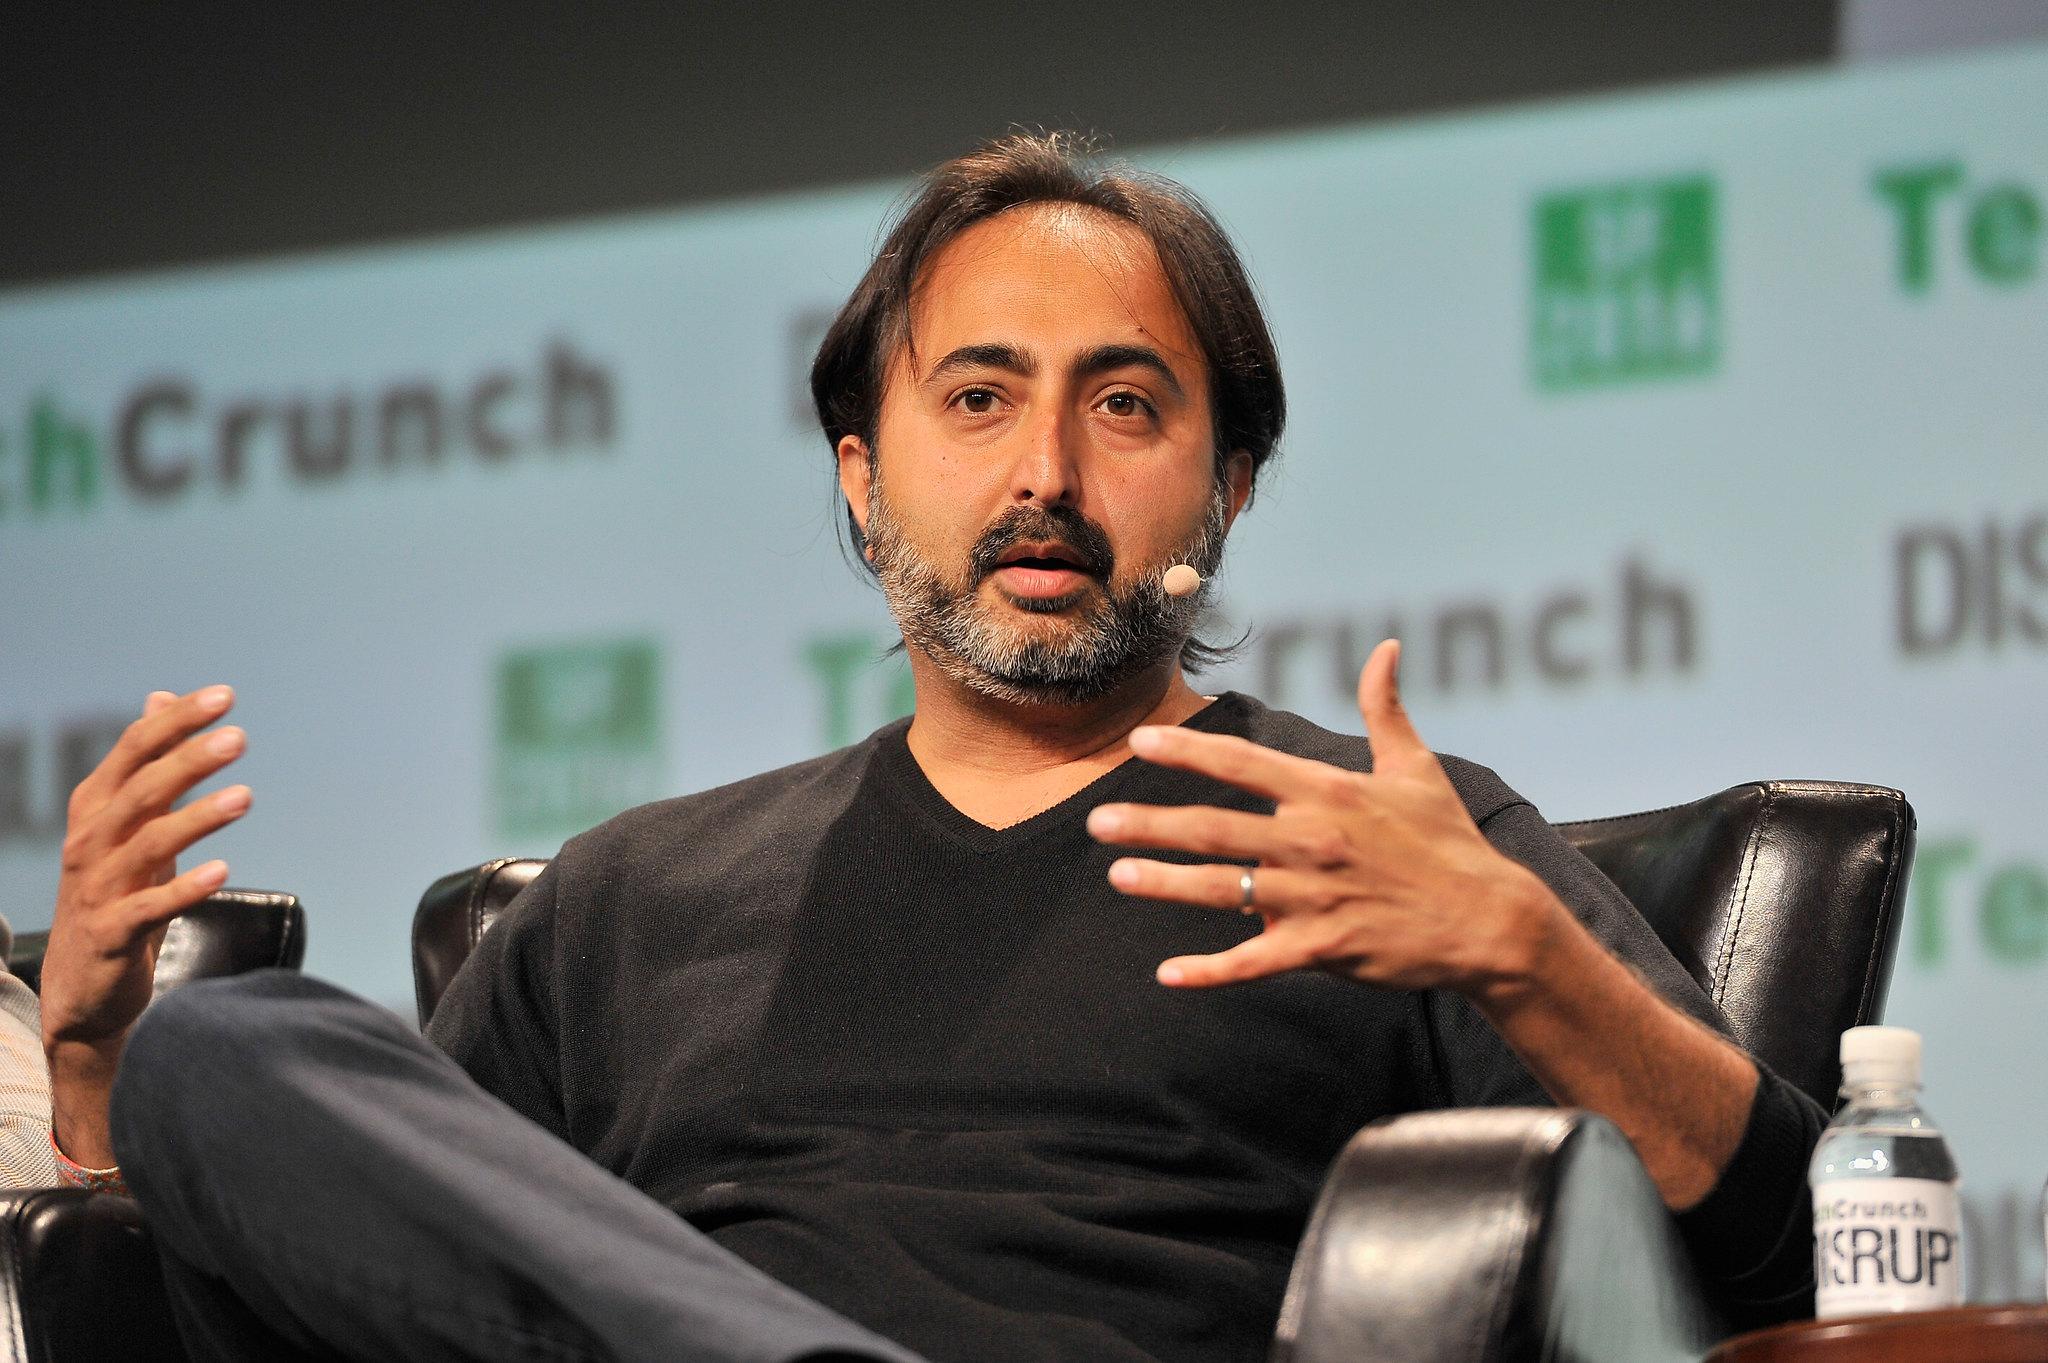 Venture Capital Firm General Catalyst Raises $2.3 Billion Amid Coronavirus Crisis.